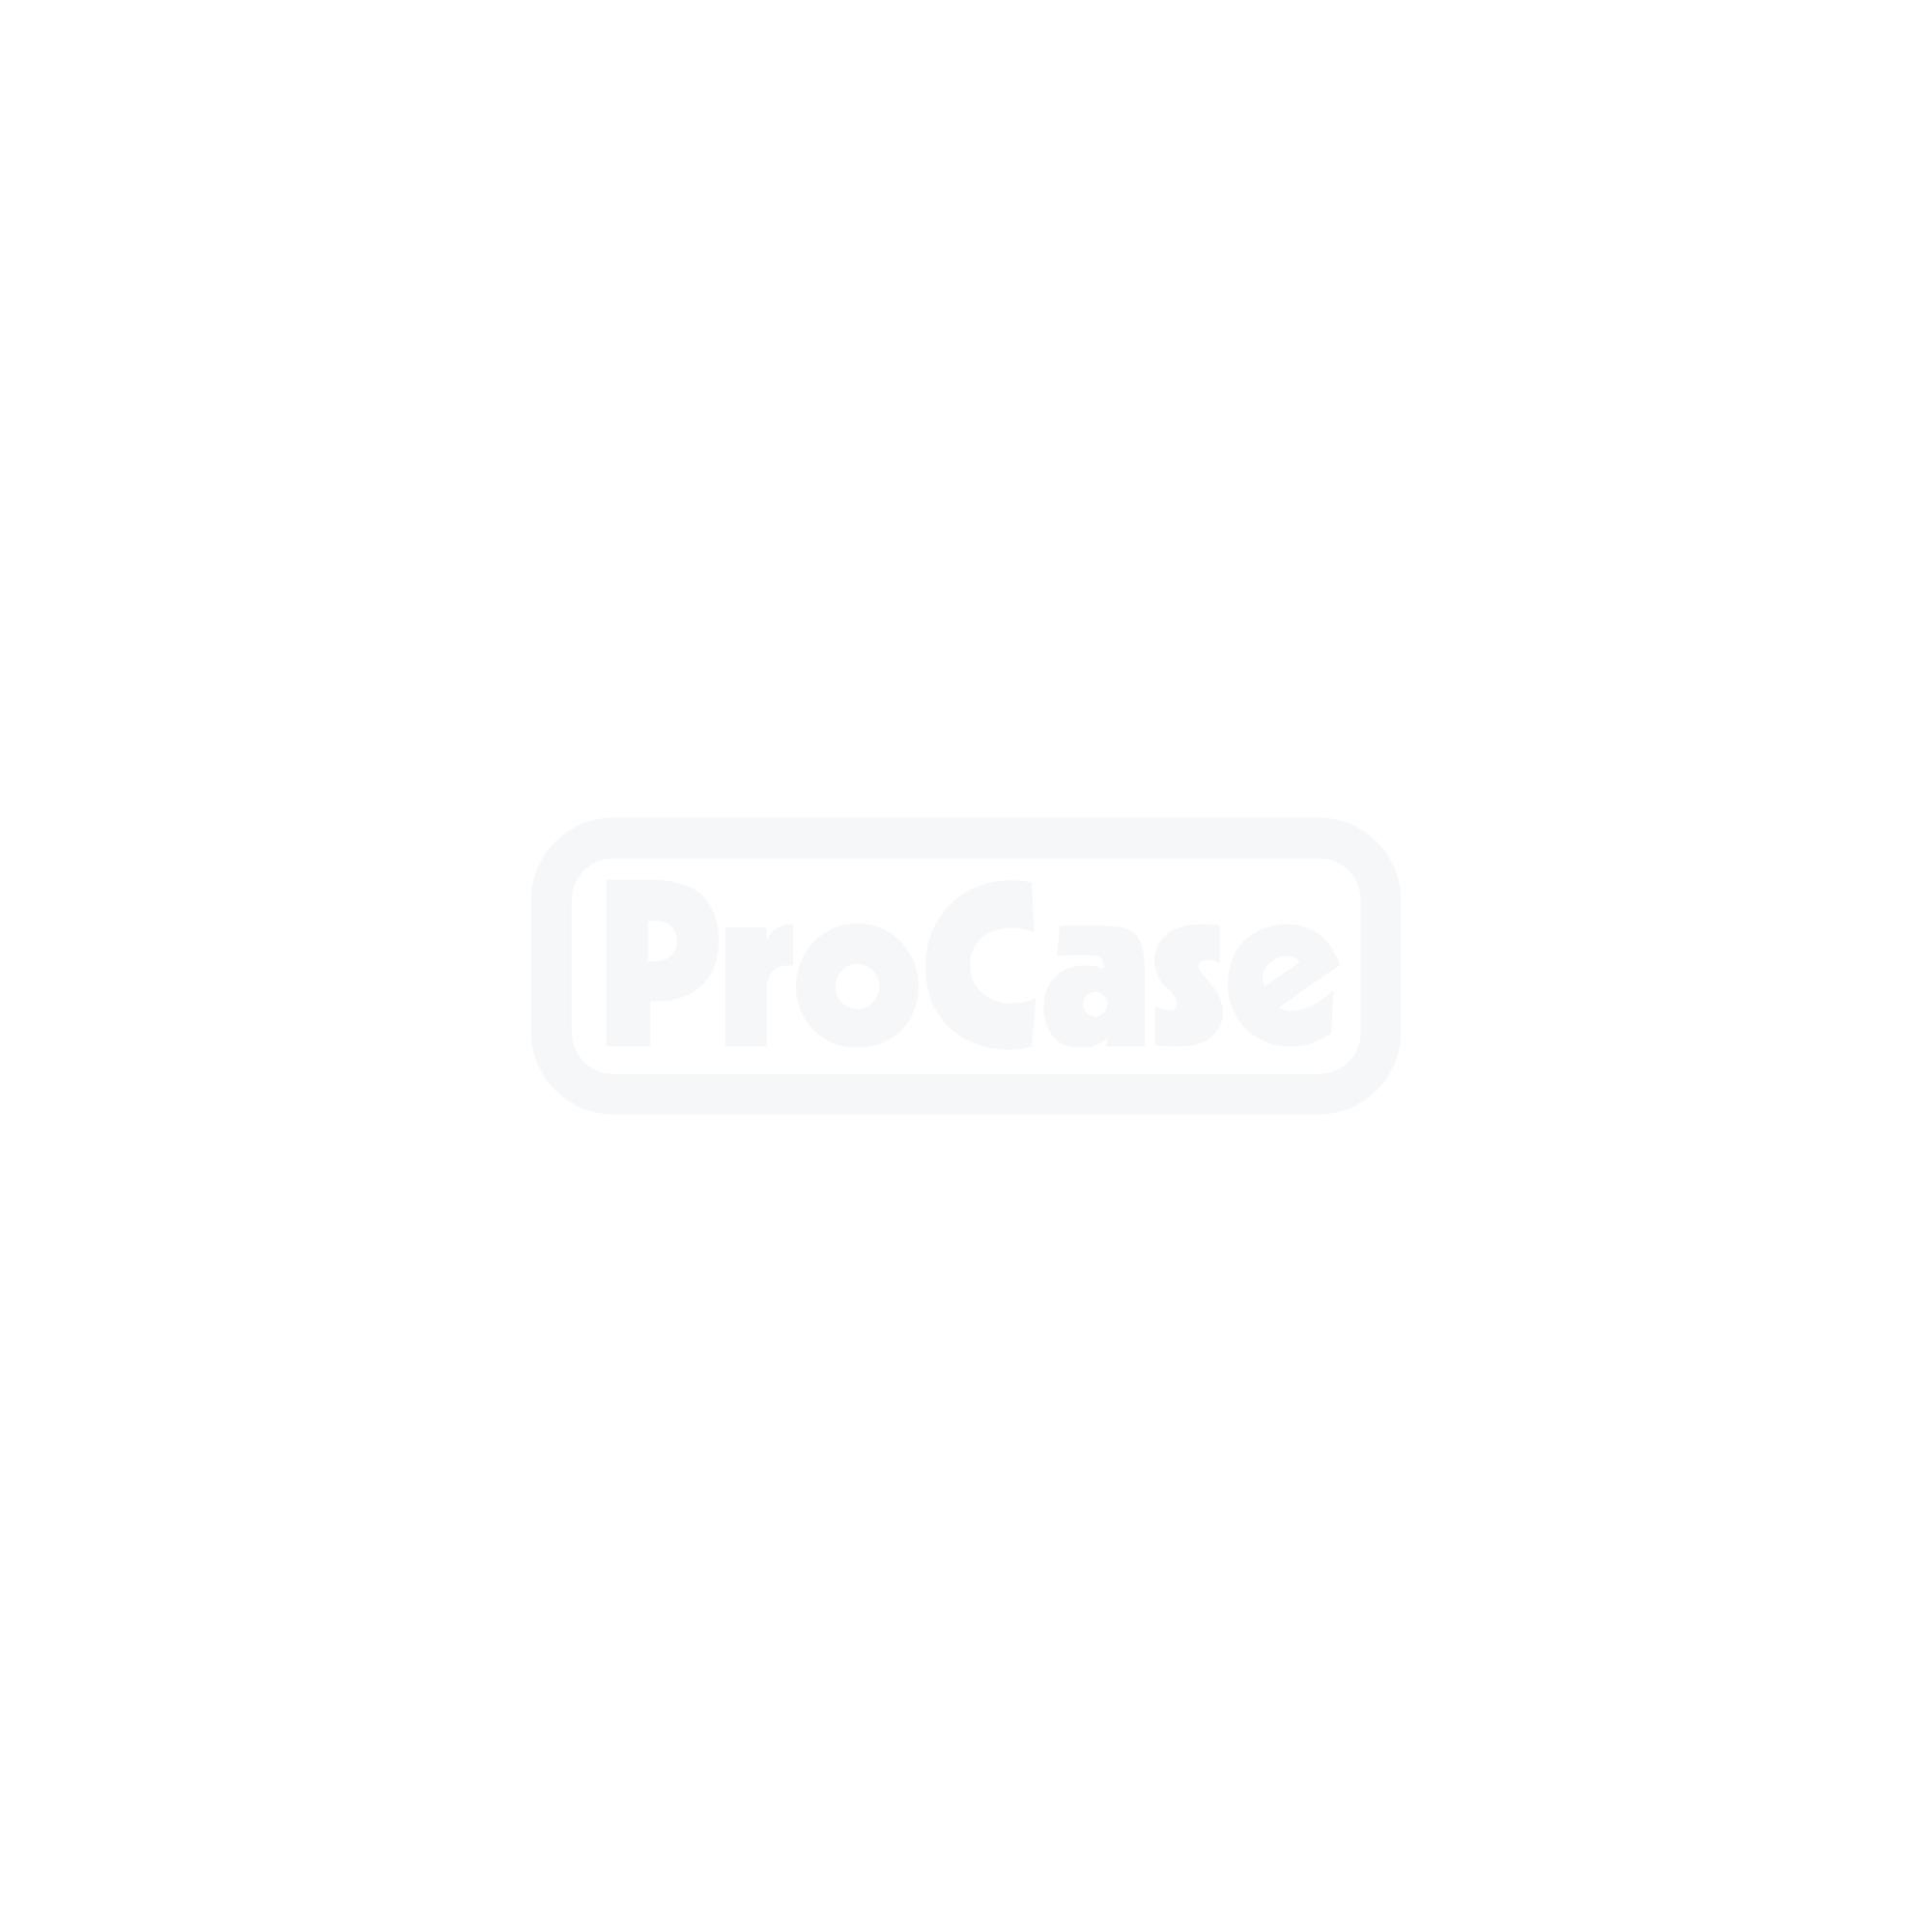 TFT-Monitor-Doppel-FLEX-Case